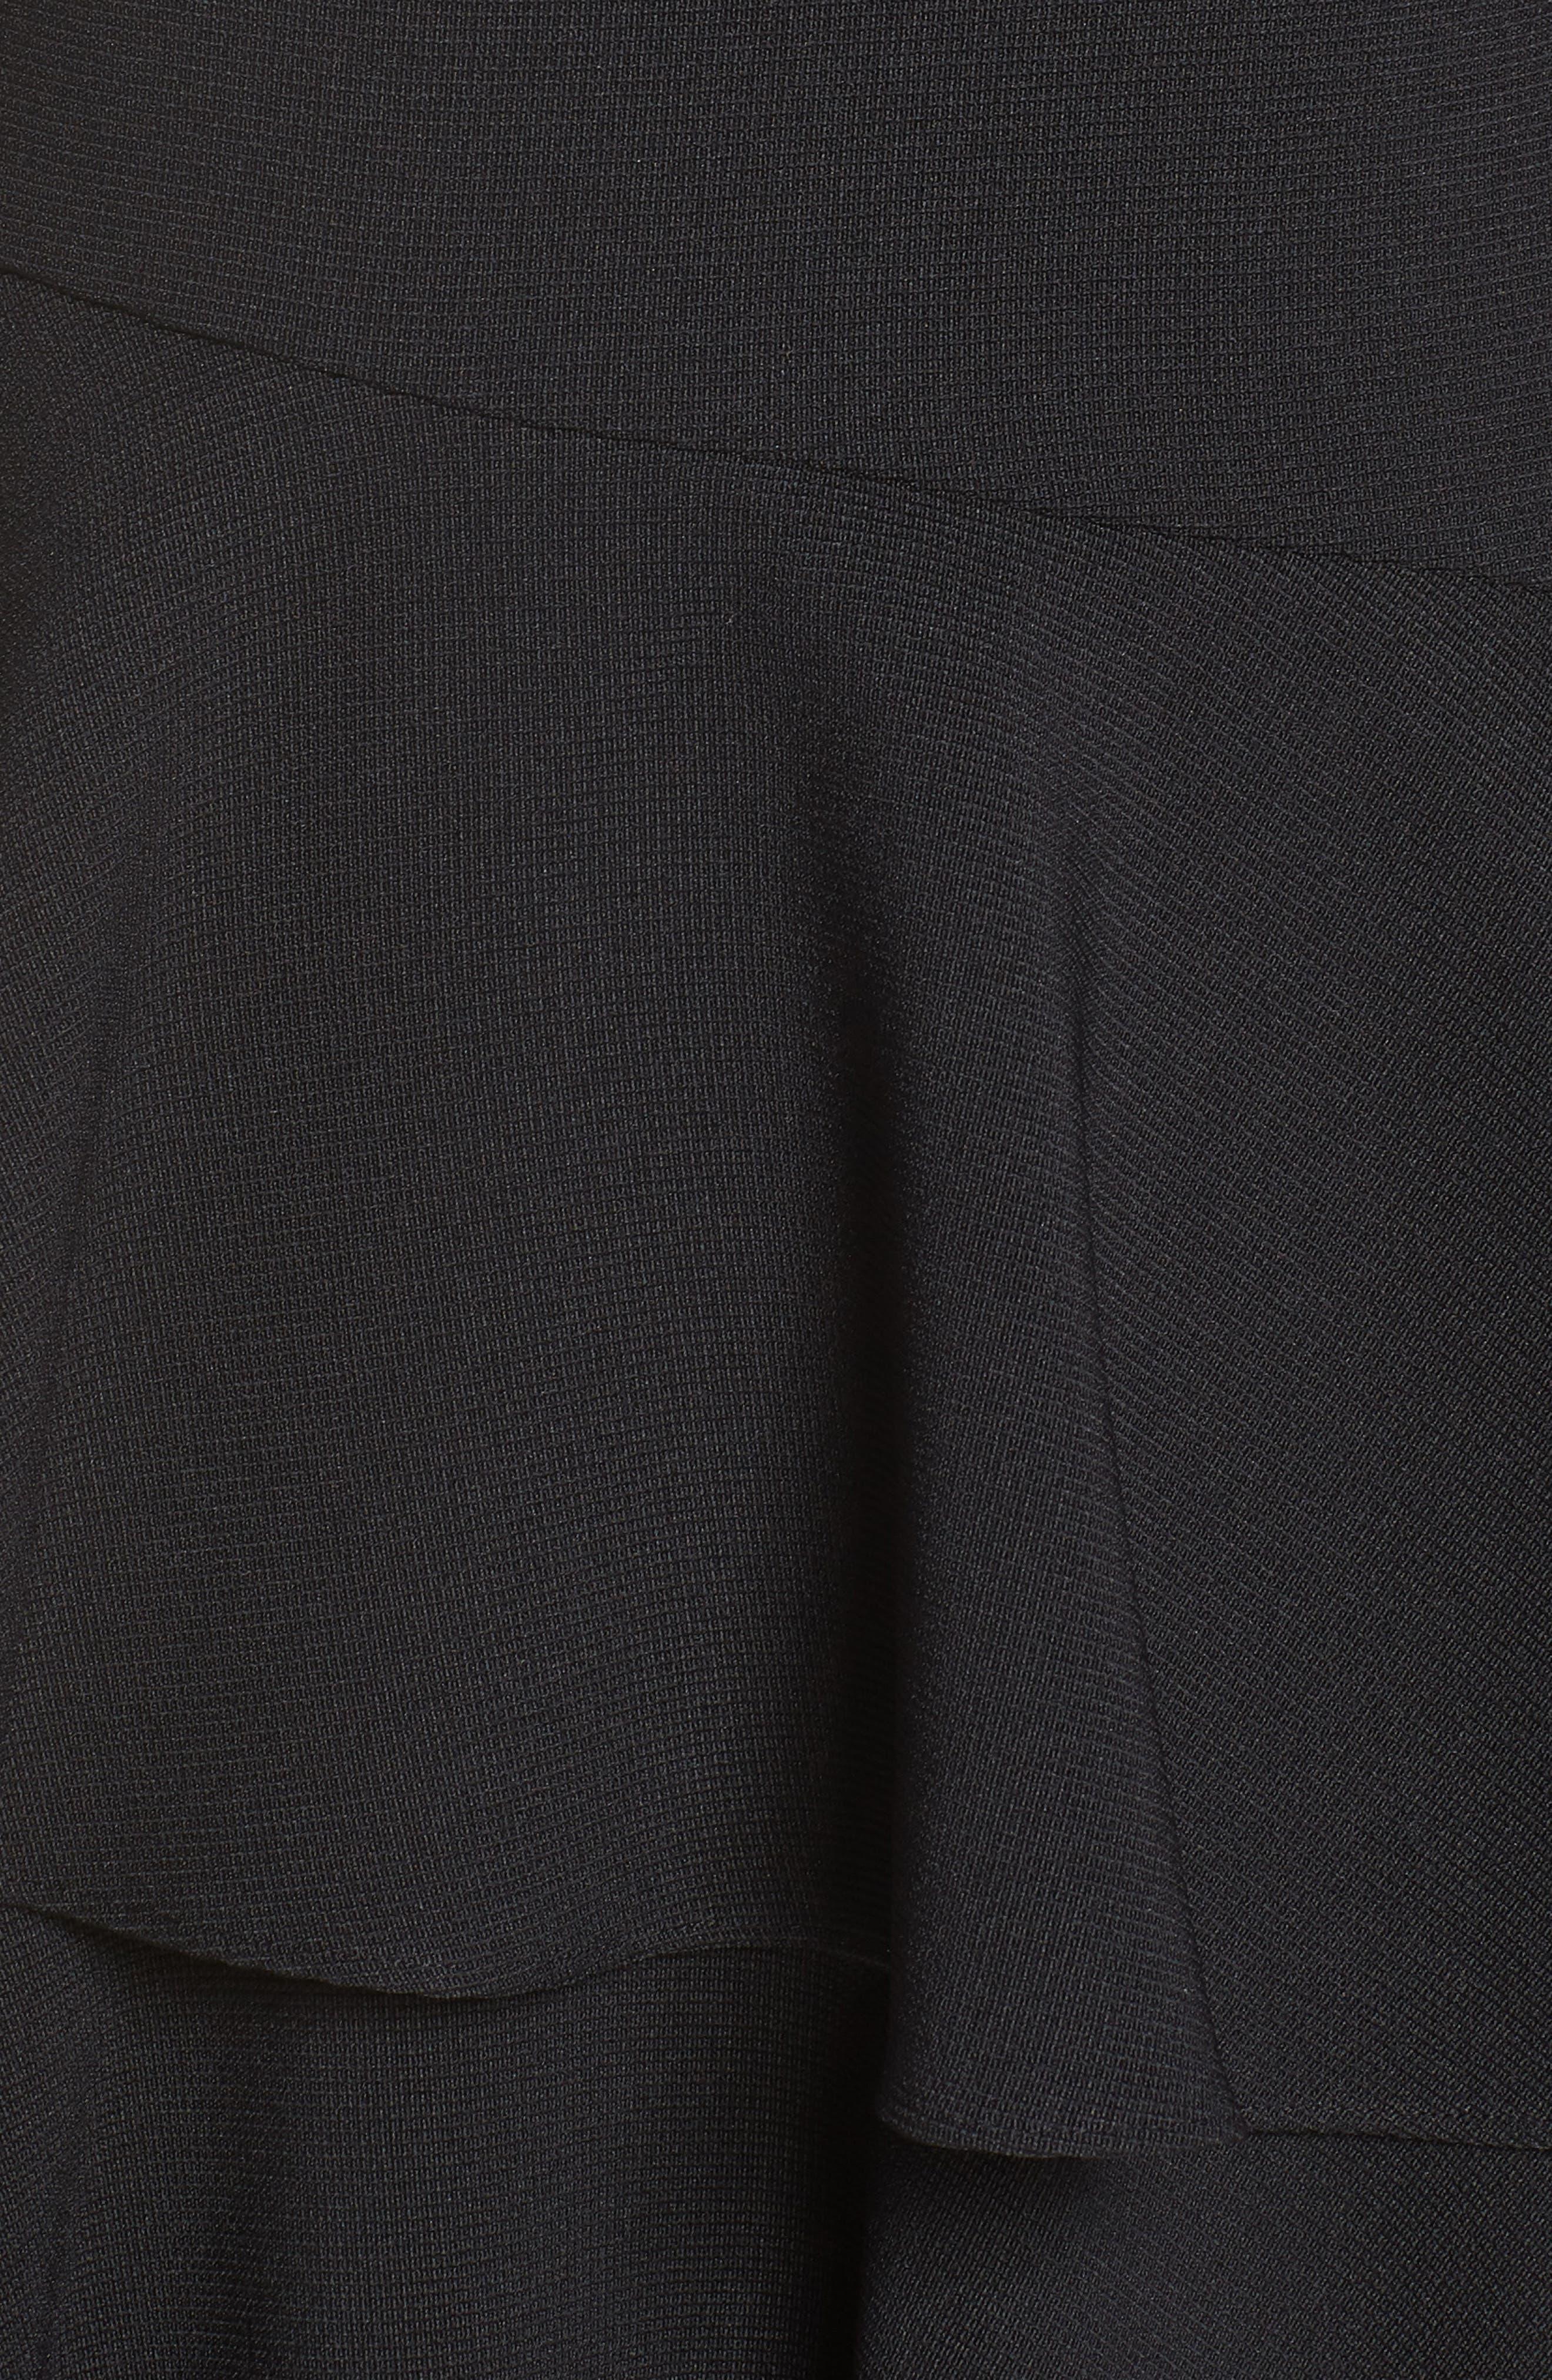 ELIZA J, Tiered Ruffle Knit Dress, Alternate thumbnail 6, color, 001